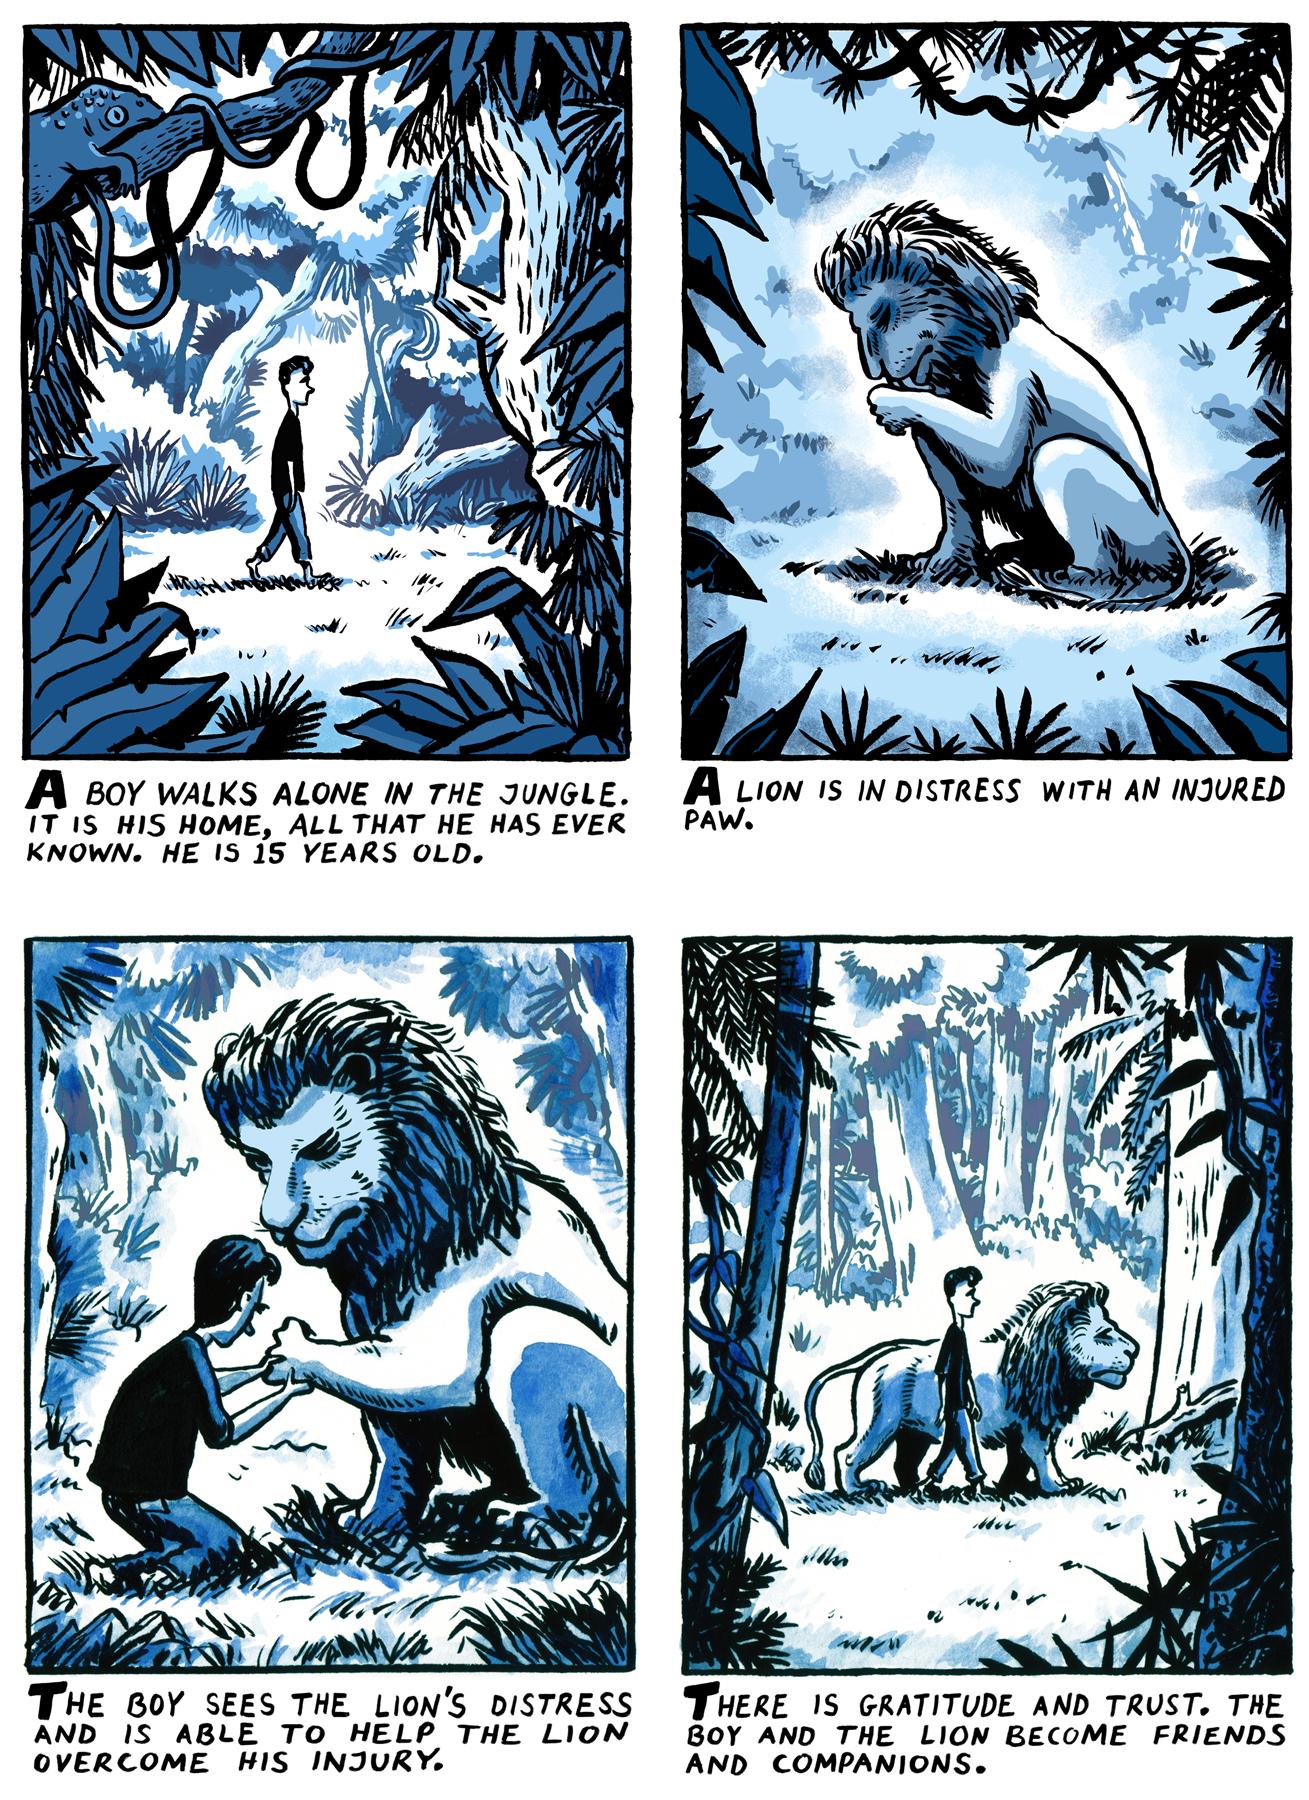 My Extraordinary Dream, panels 1-4.